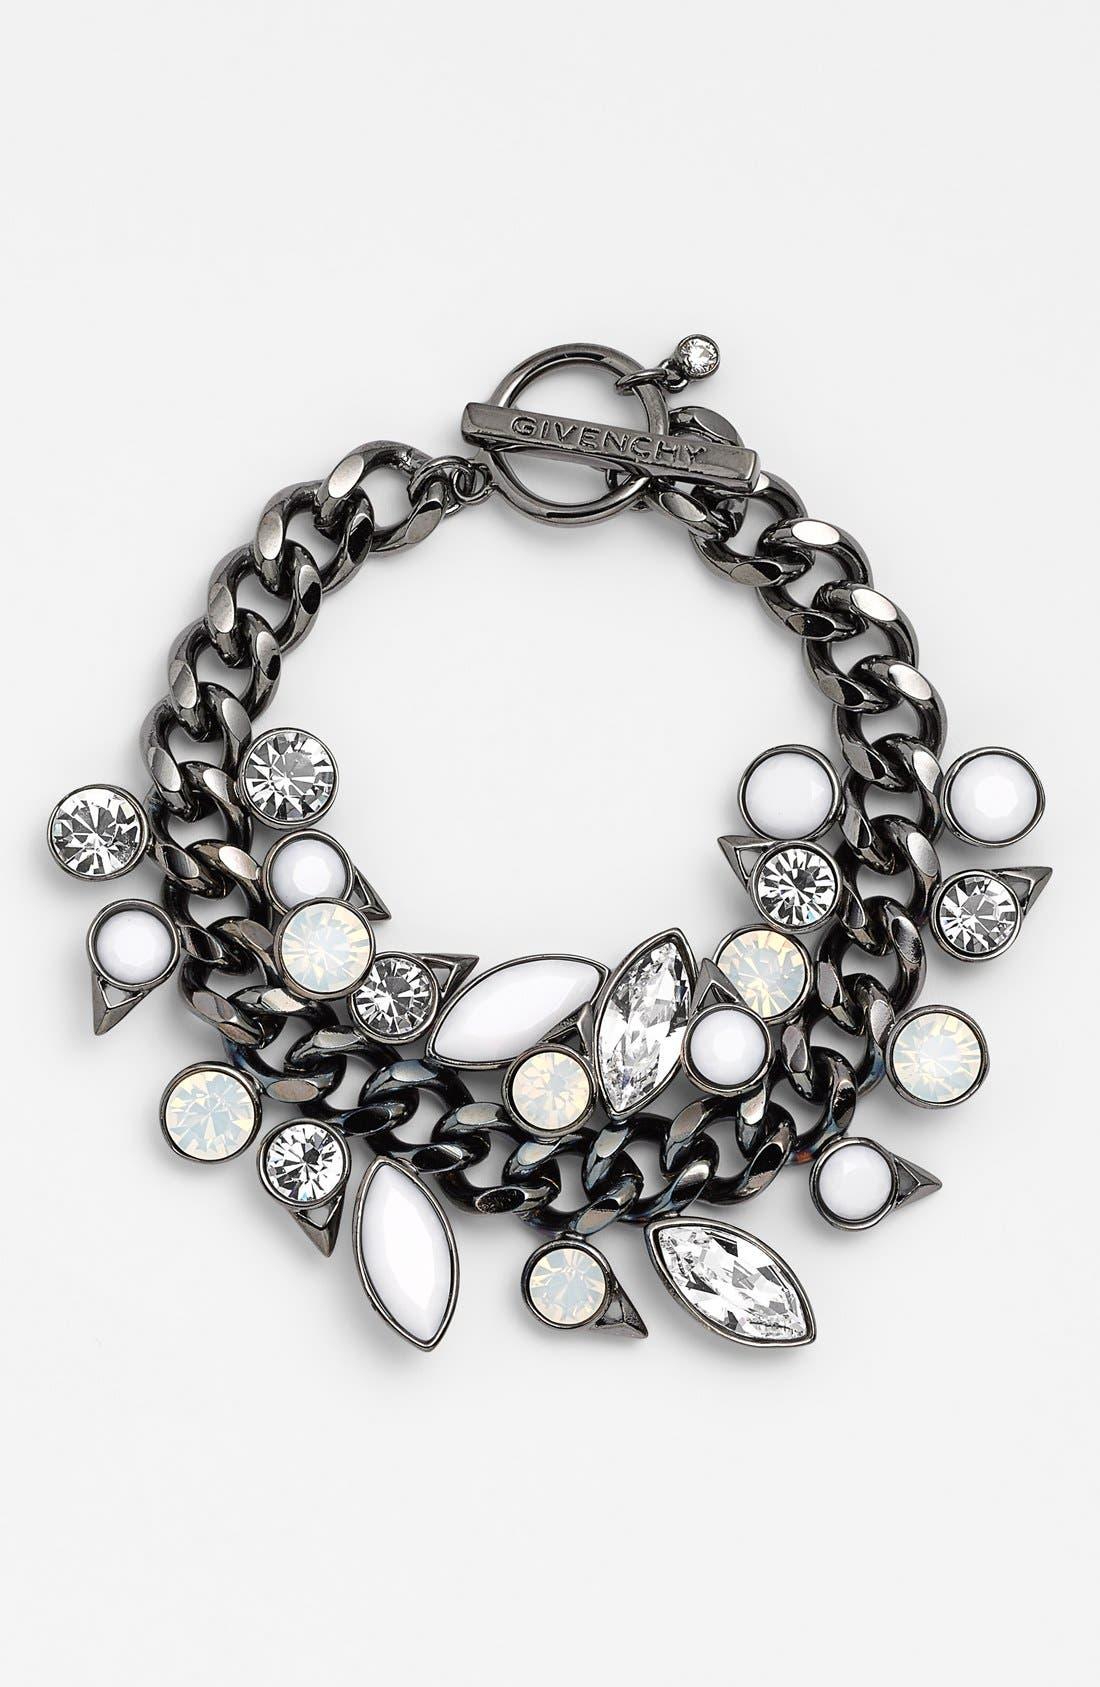 Alternate Image 1 Selected - Givenchy Toggle Bracelet